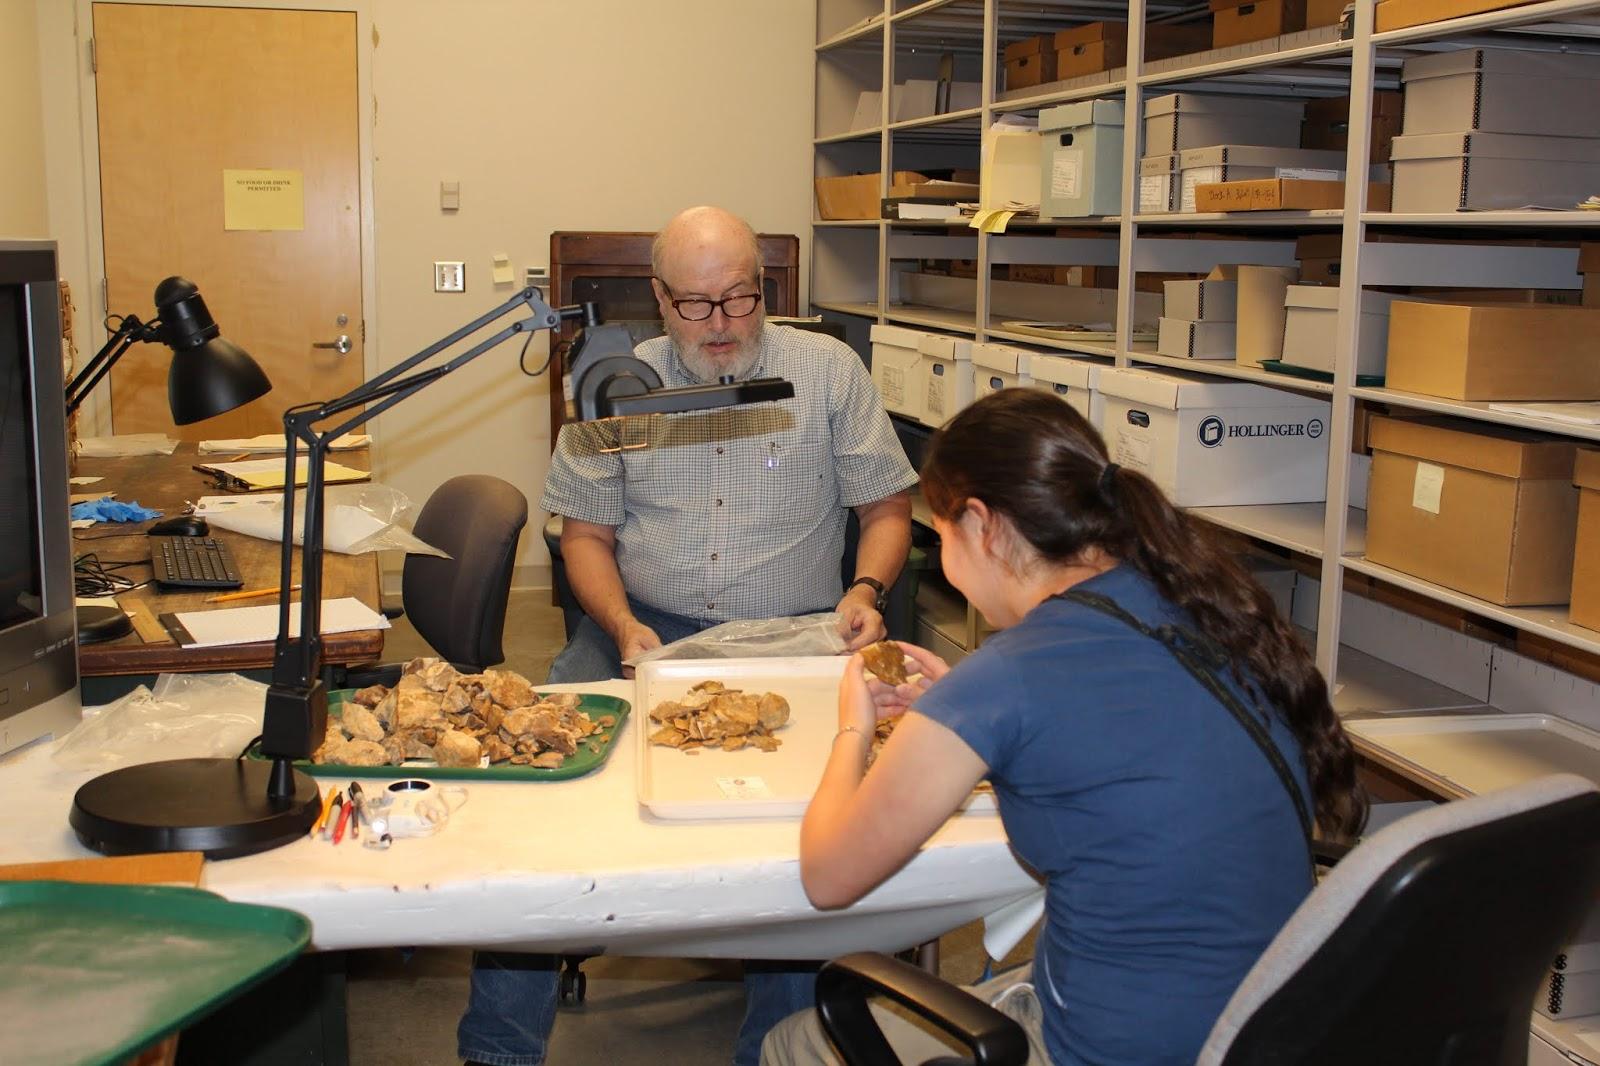 Pennsylvania Archaeology on Feedspot - Rss Feed